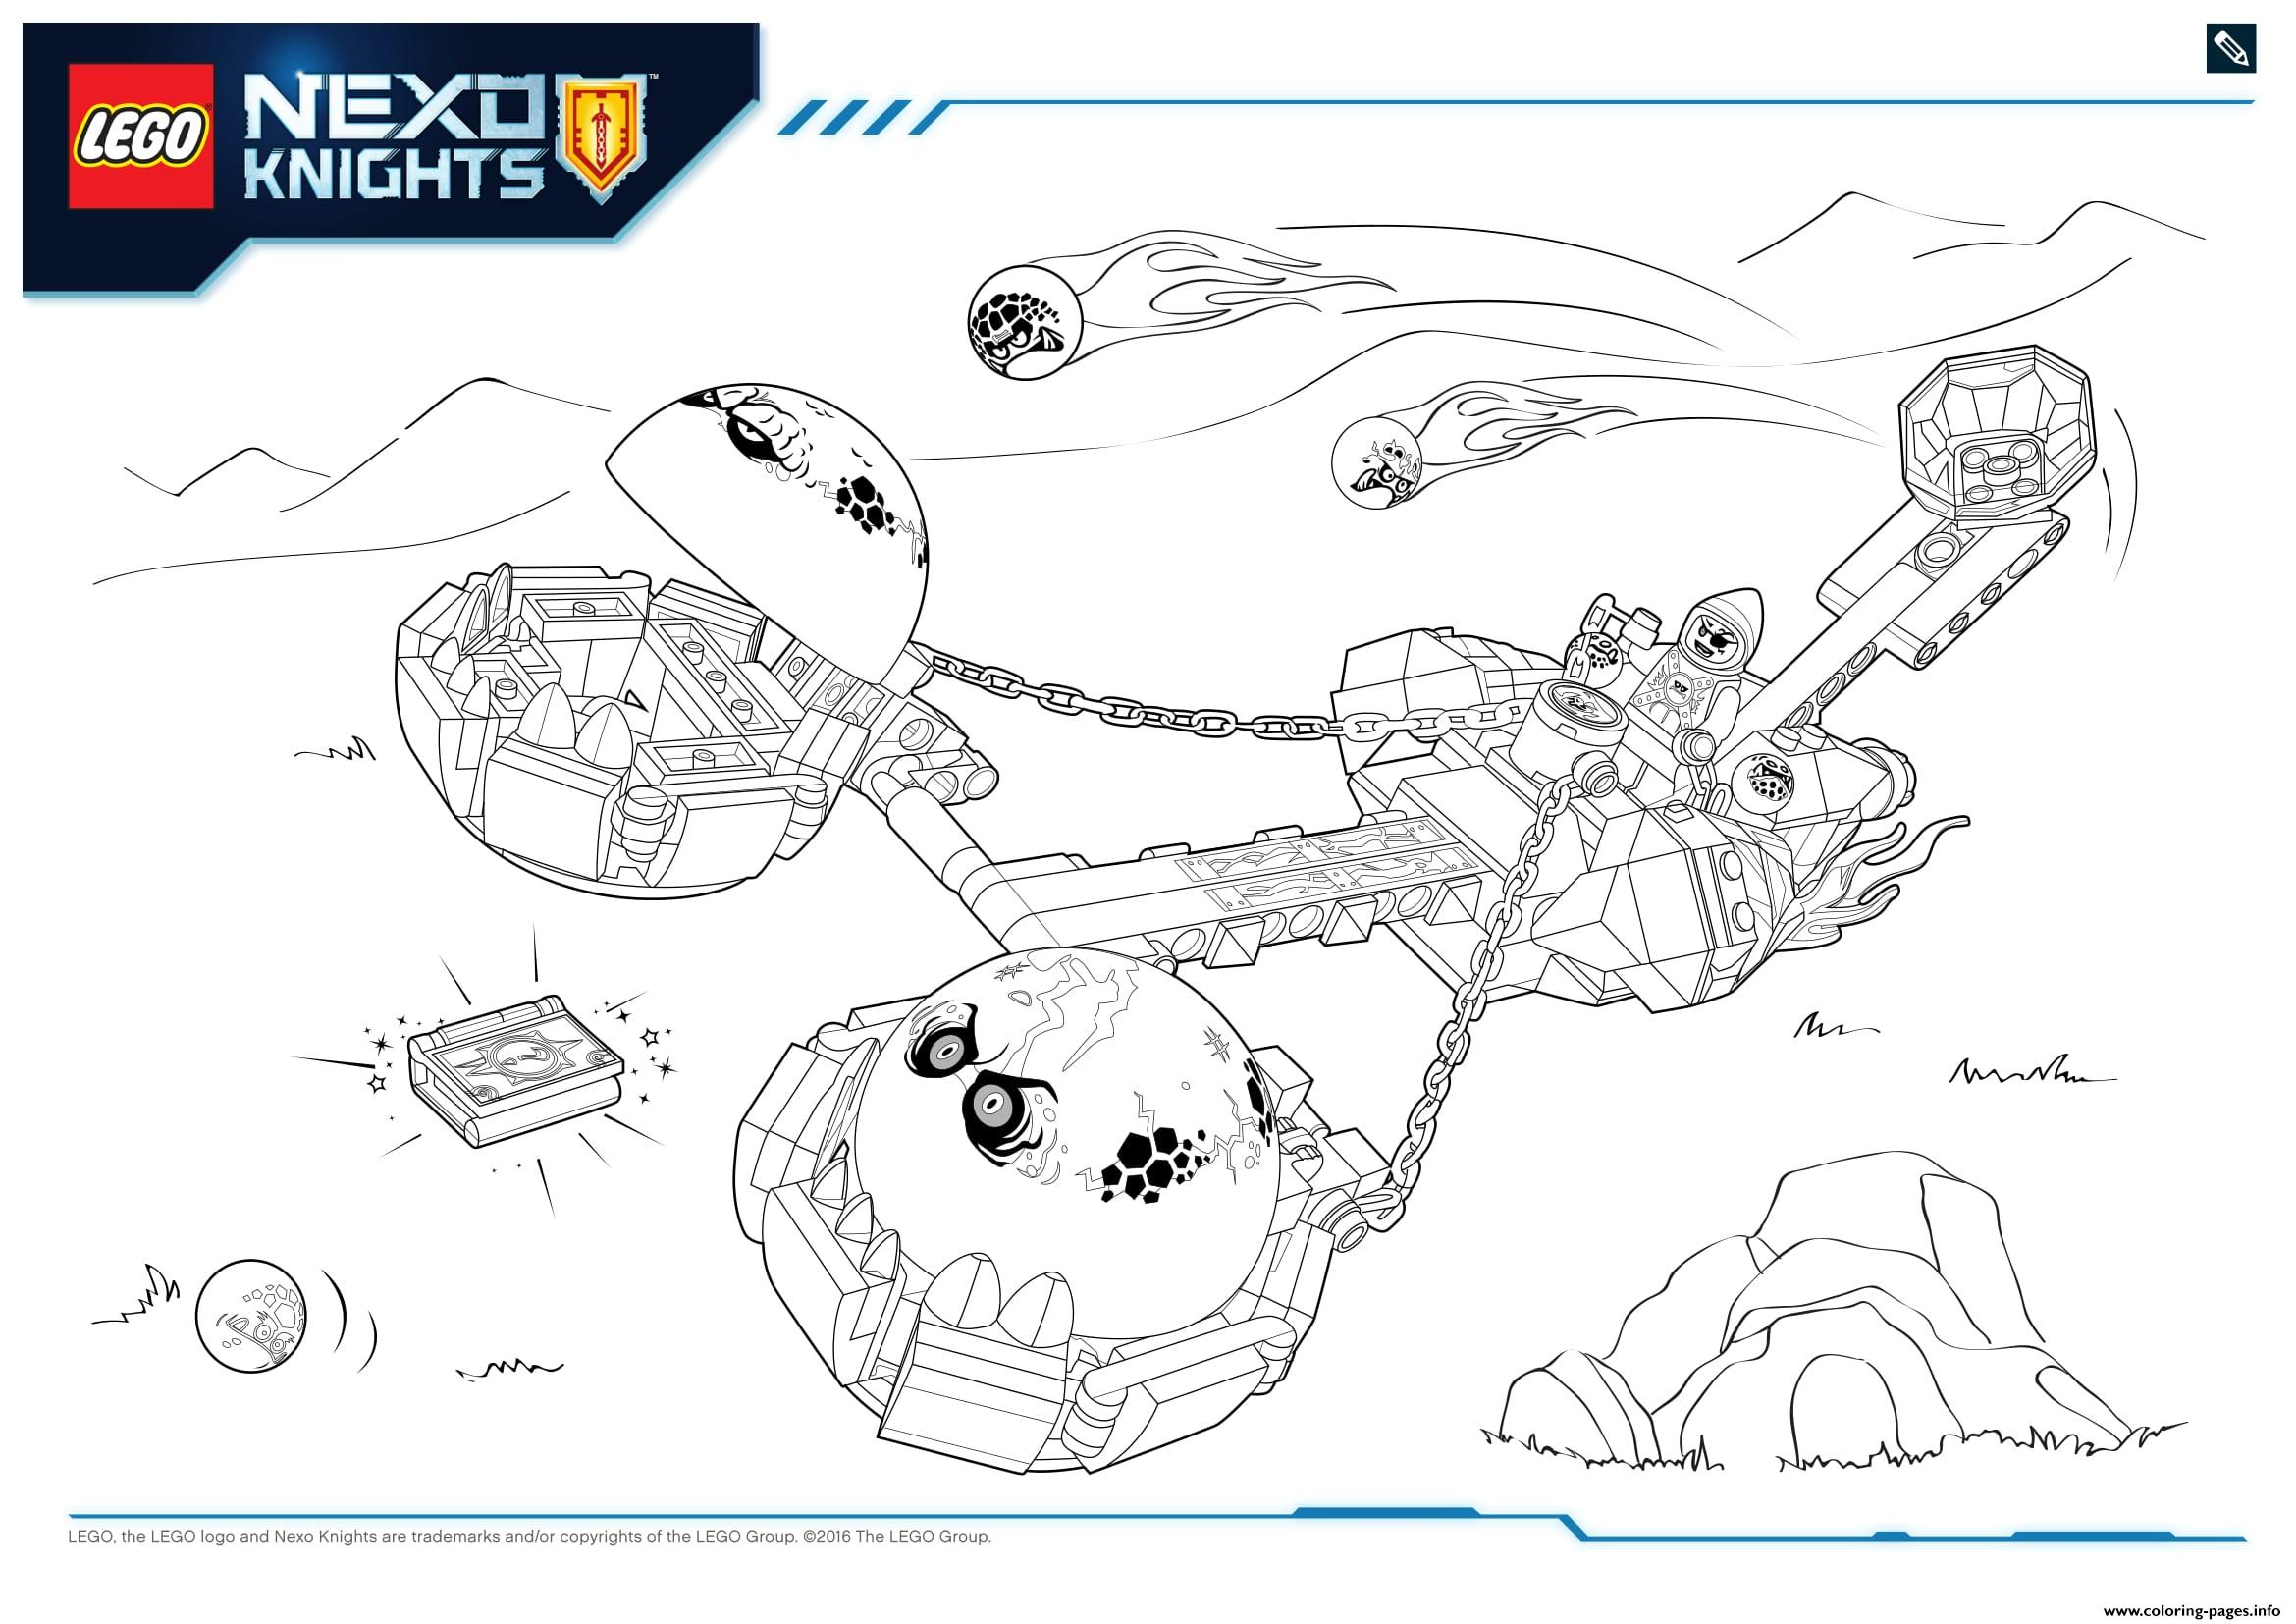 Lego Nexo Knights LE REPAIRE VOLCANIQUE